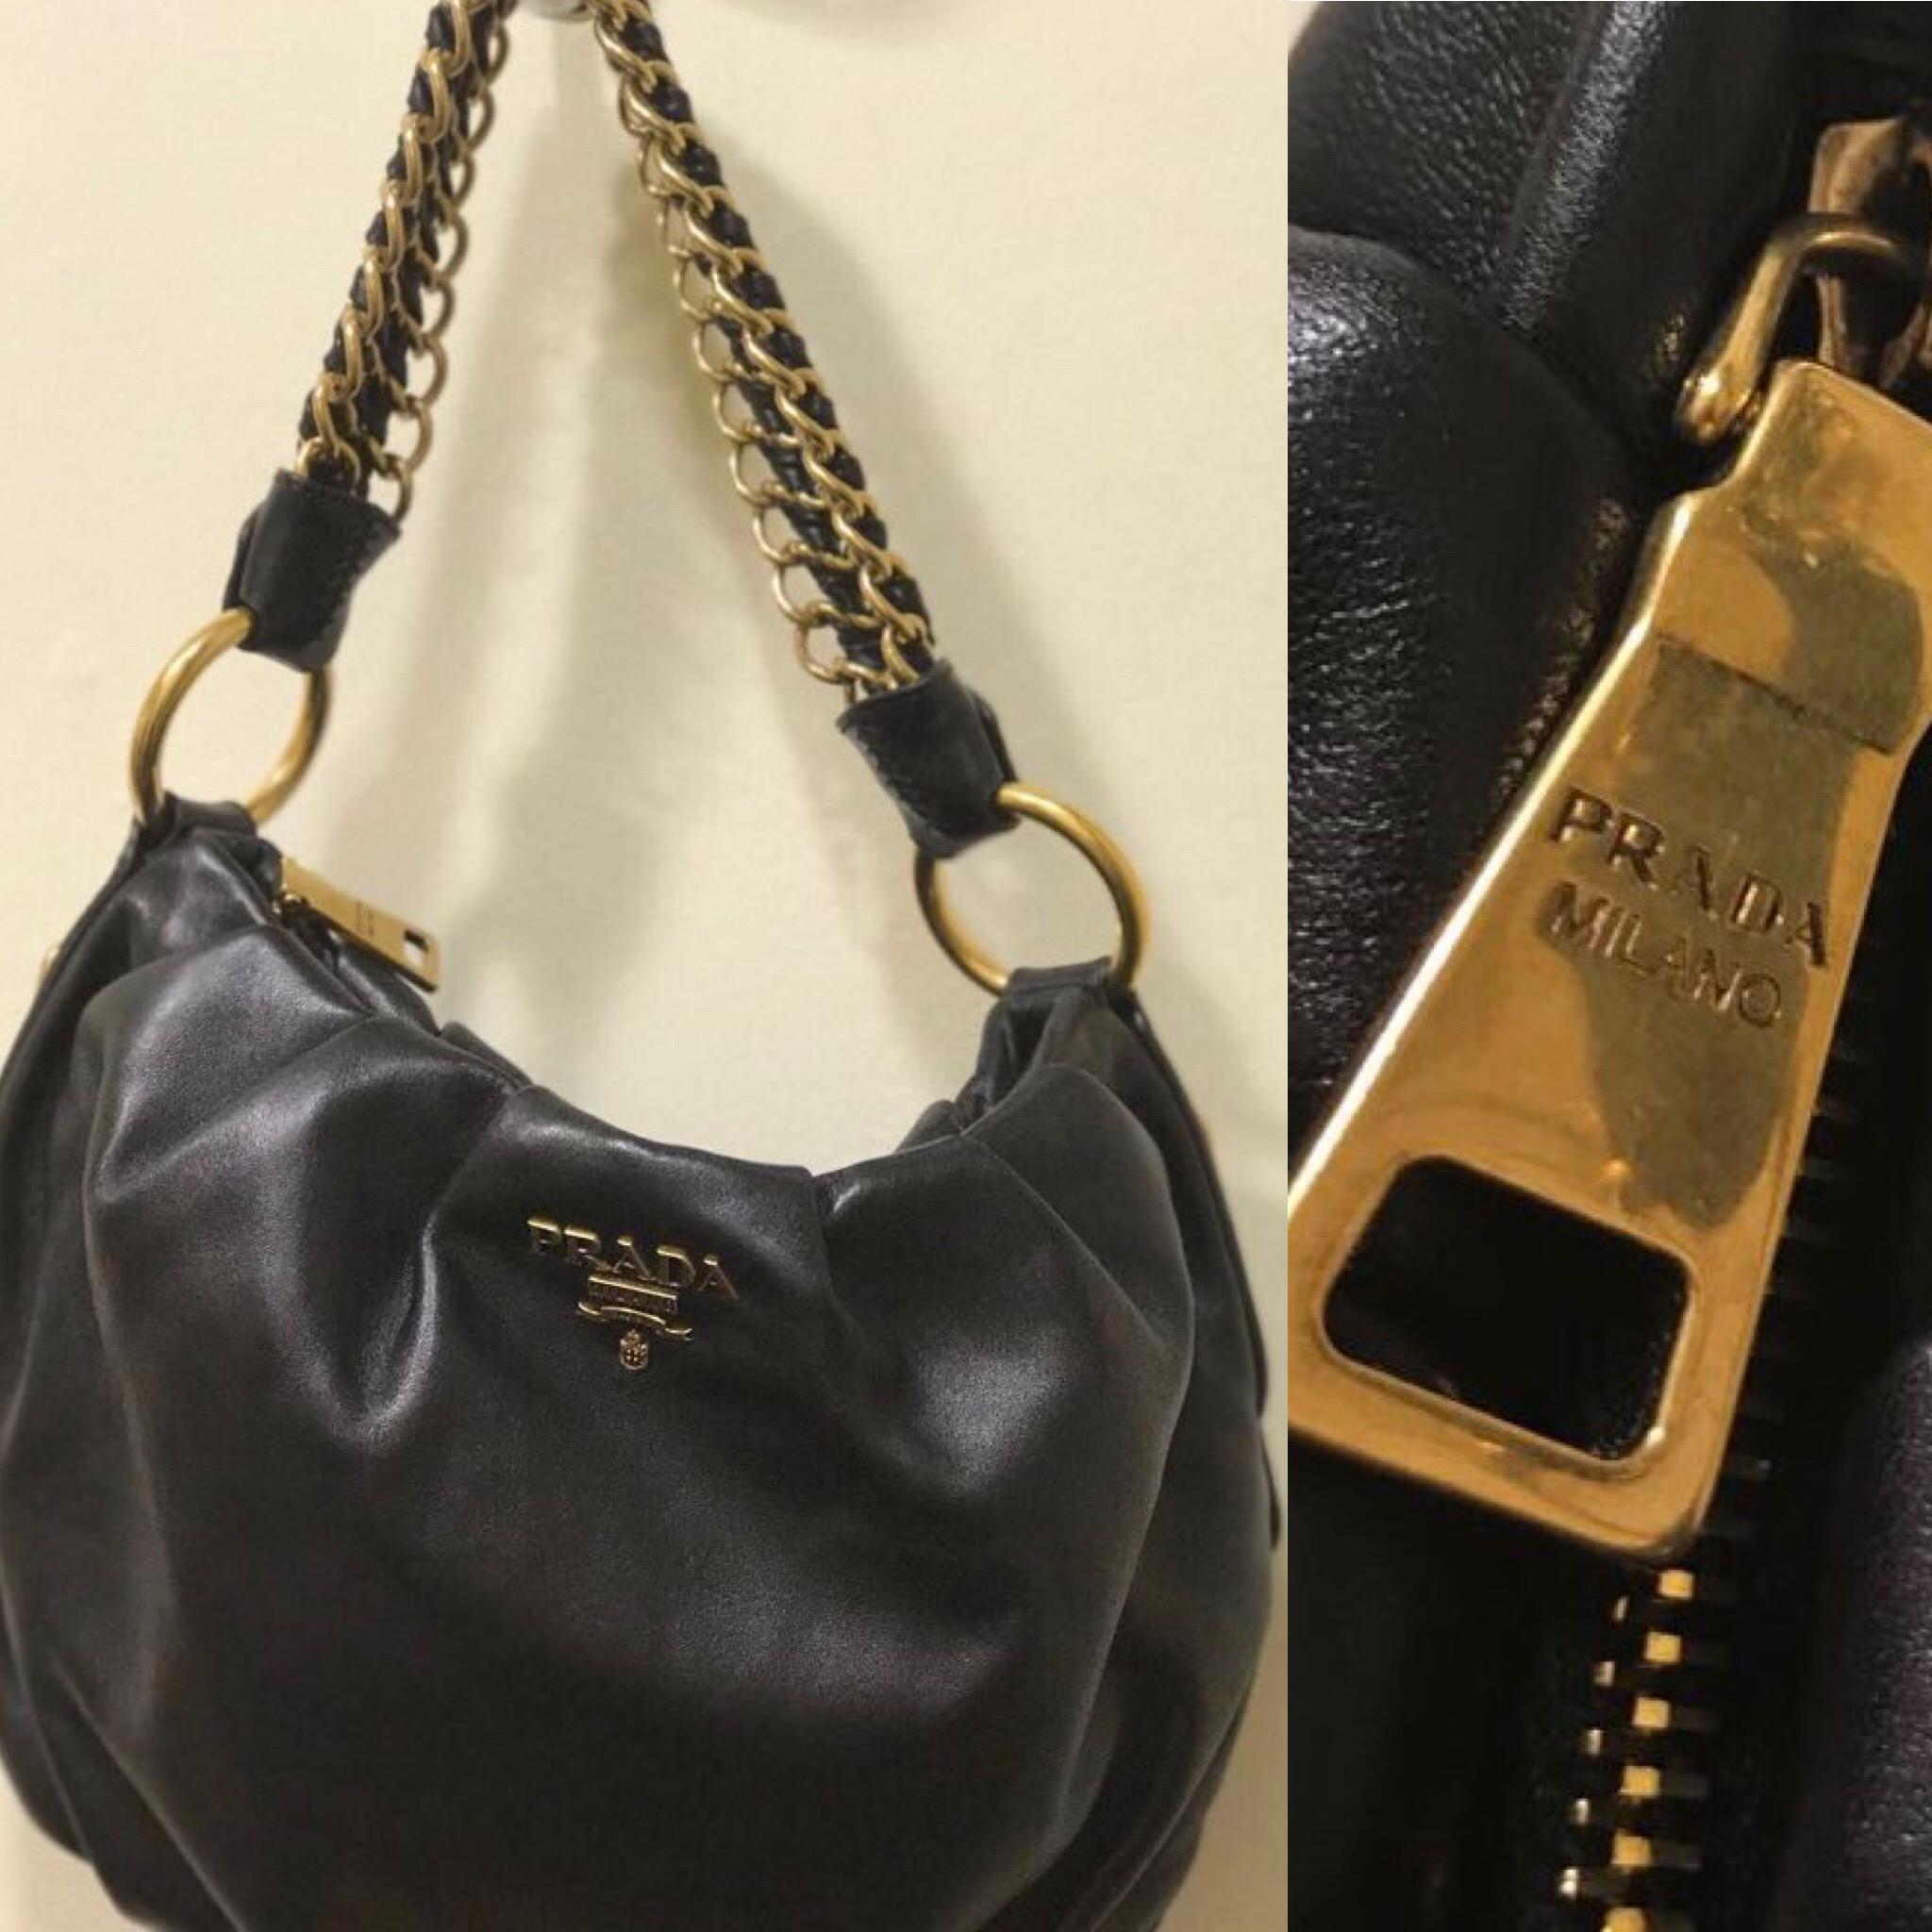 Prada bag. Gold hardware £299.JPG